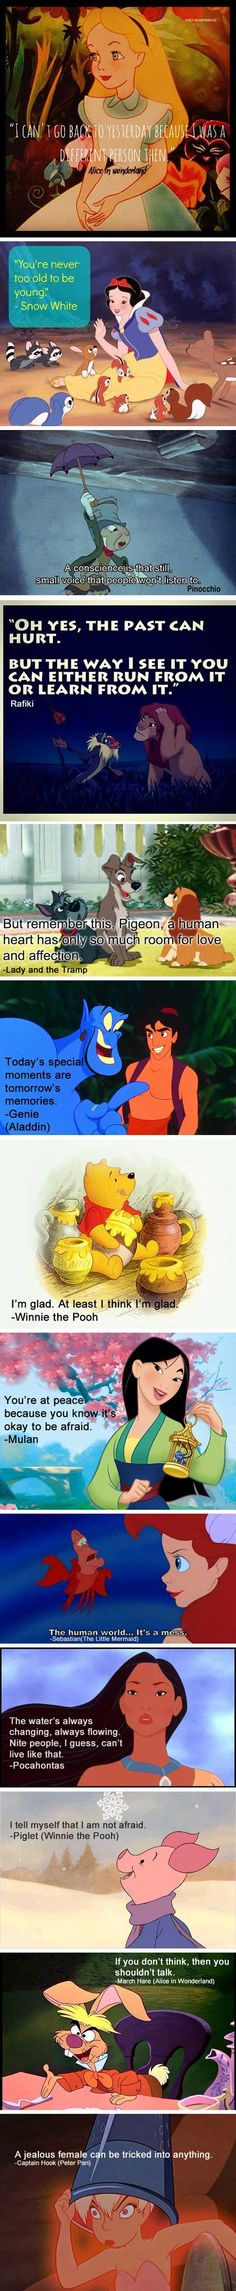 Some Disney movies quotes